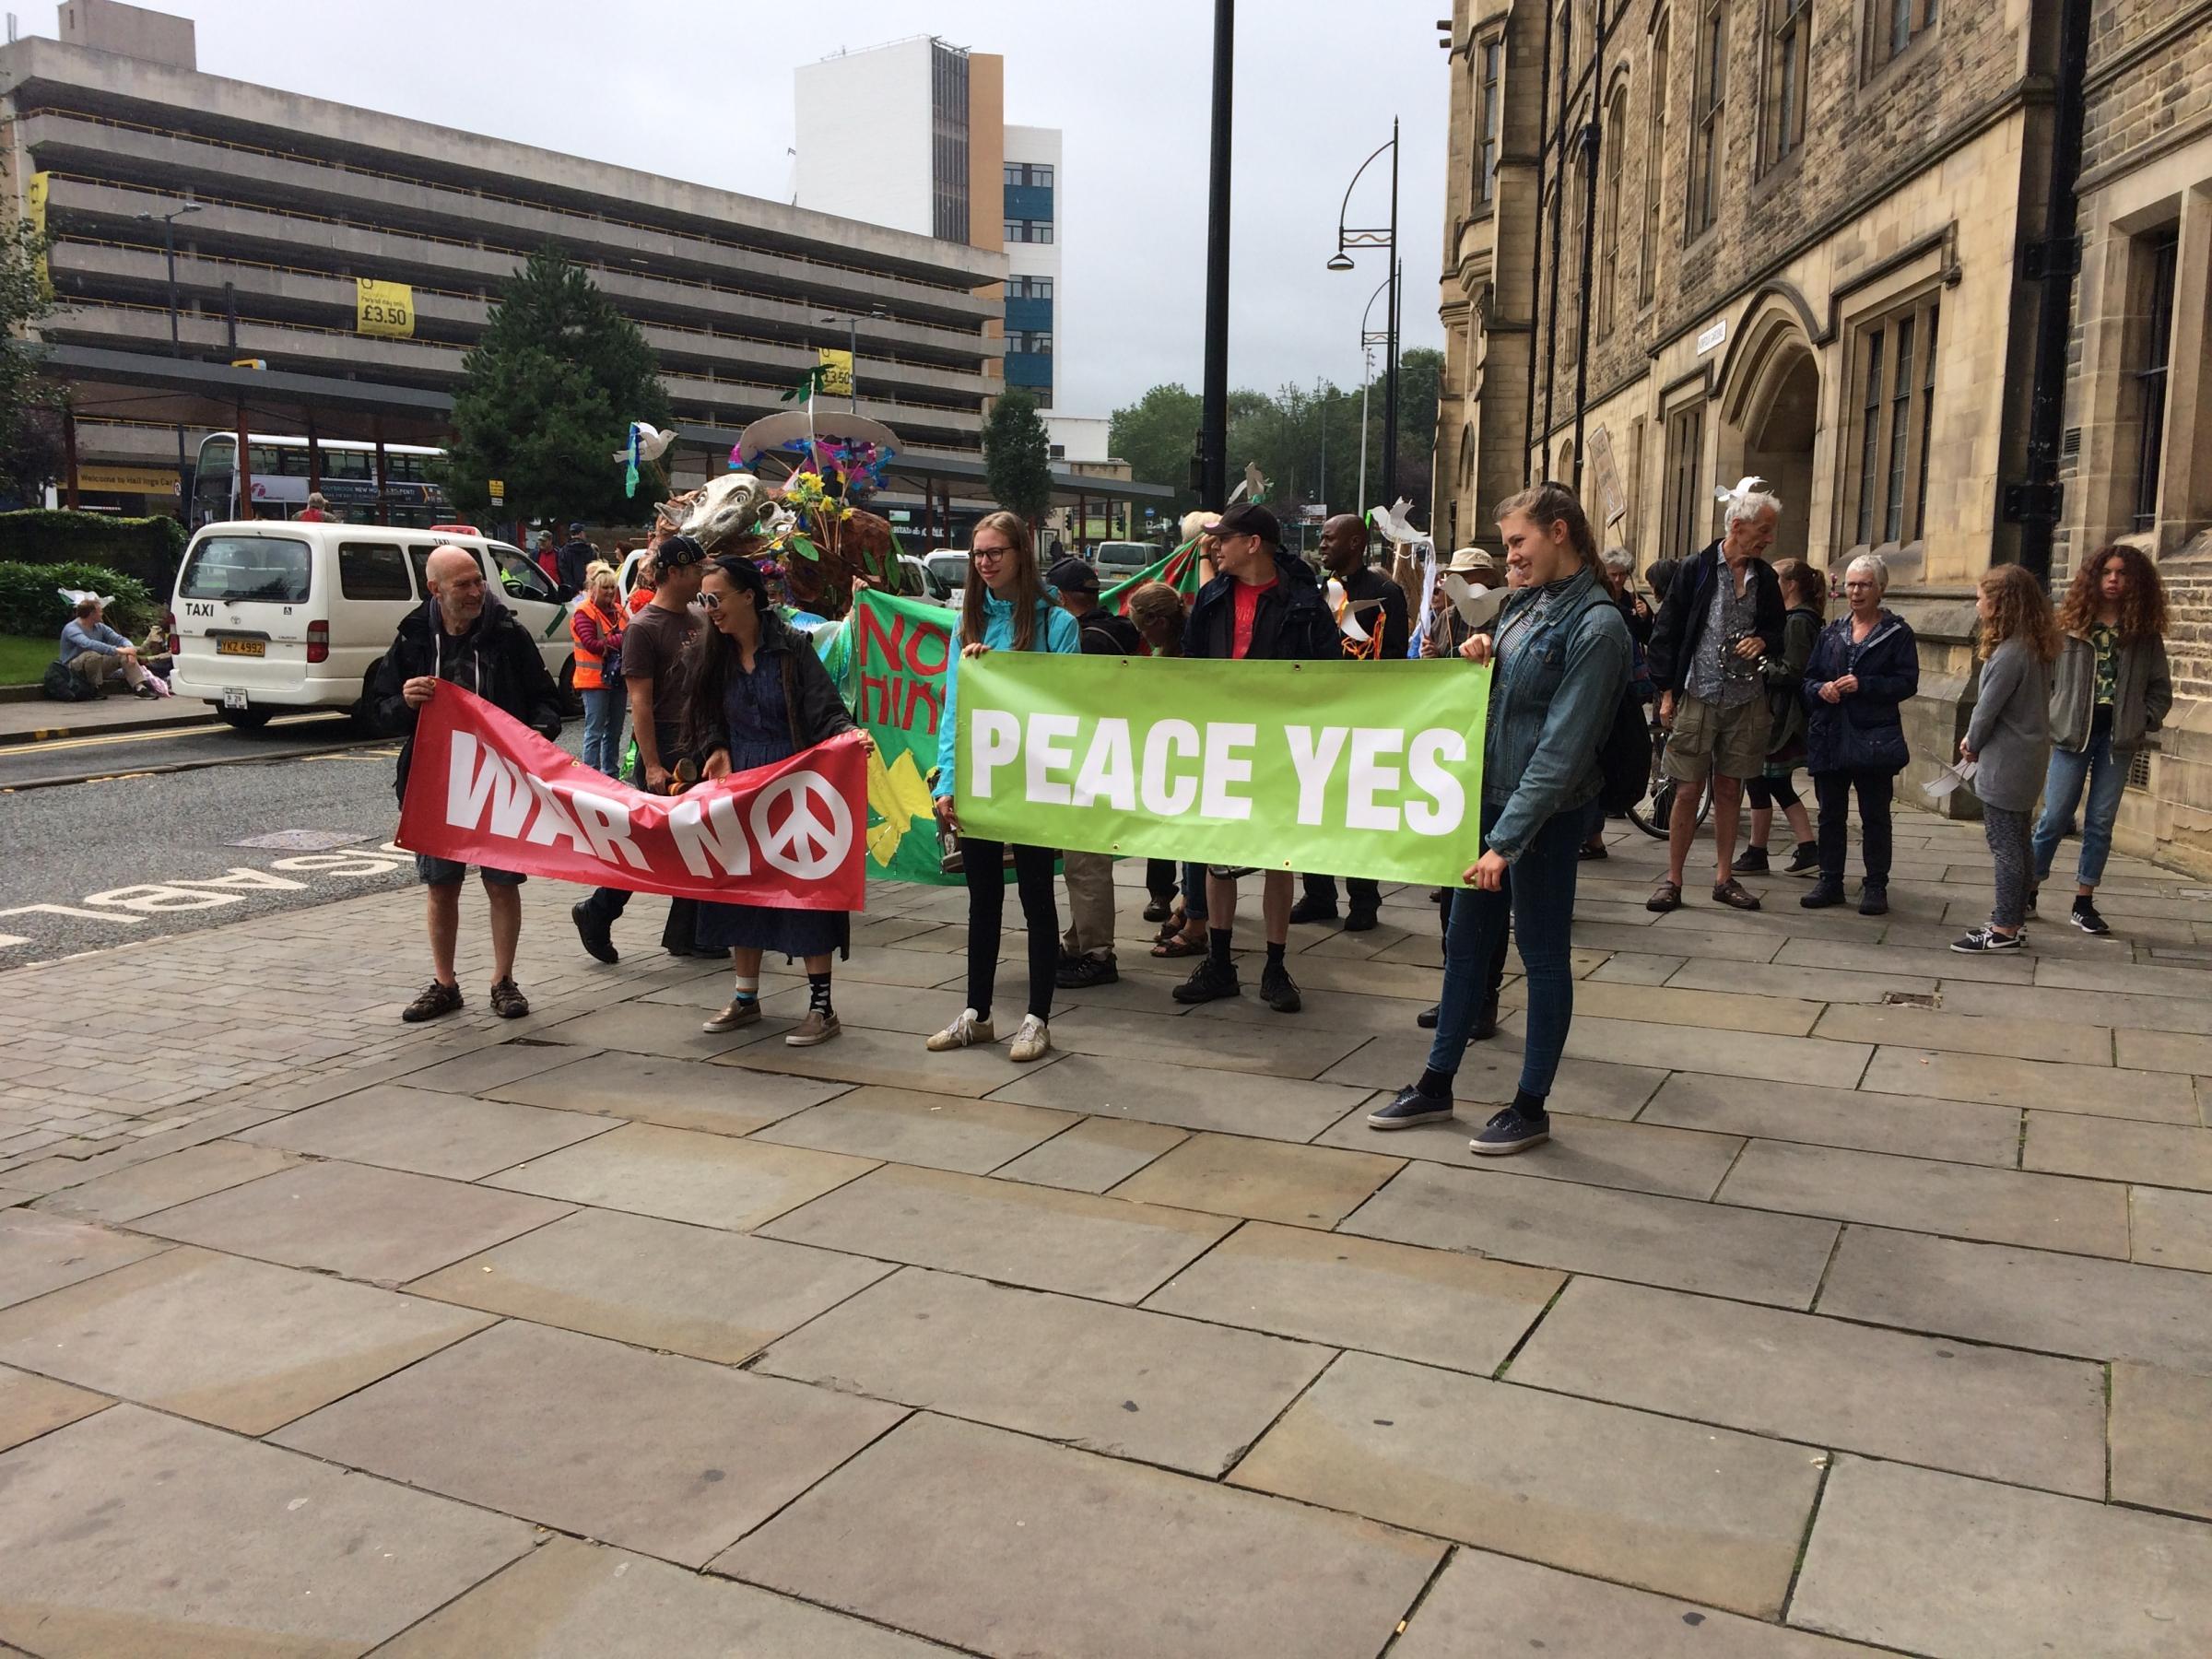 Bradford peace parade marks nuclear bombings anniversary